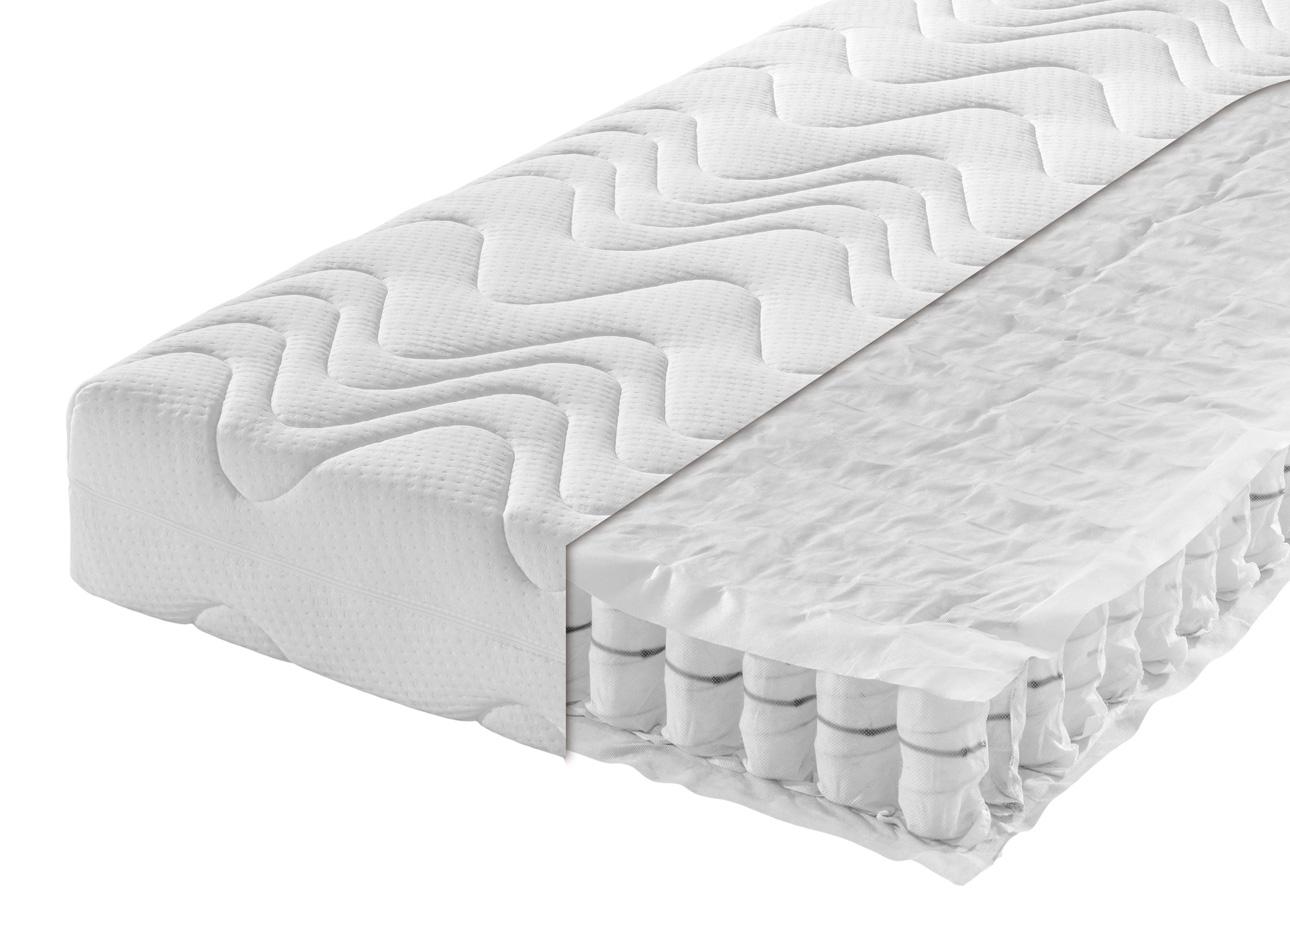 7 zonen tonnentaschenfederkern matratze flamme. Black Bedroom Furniture Sets. Home Design Ideas